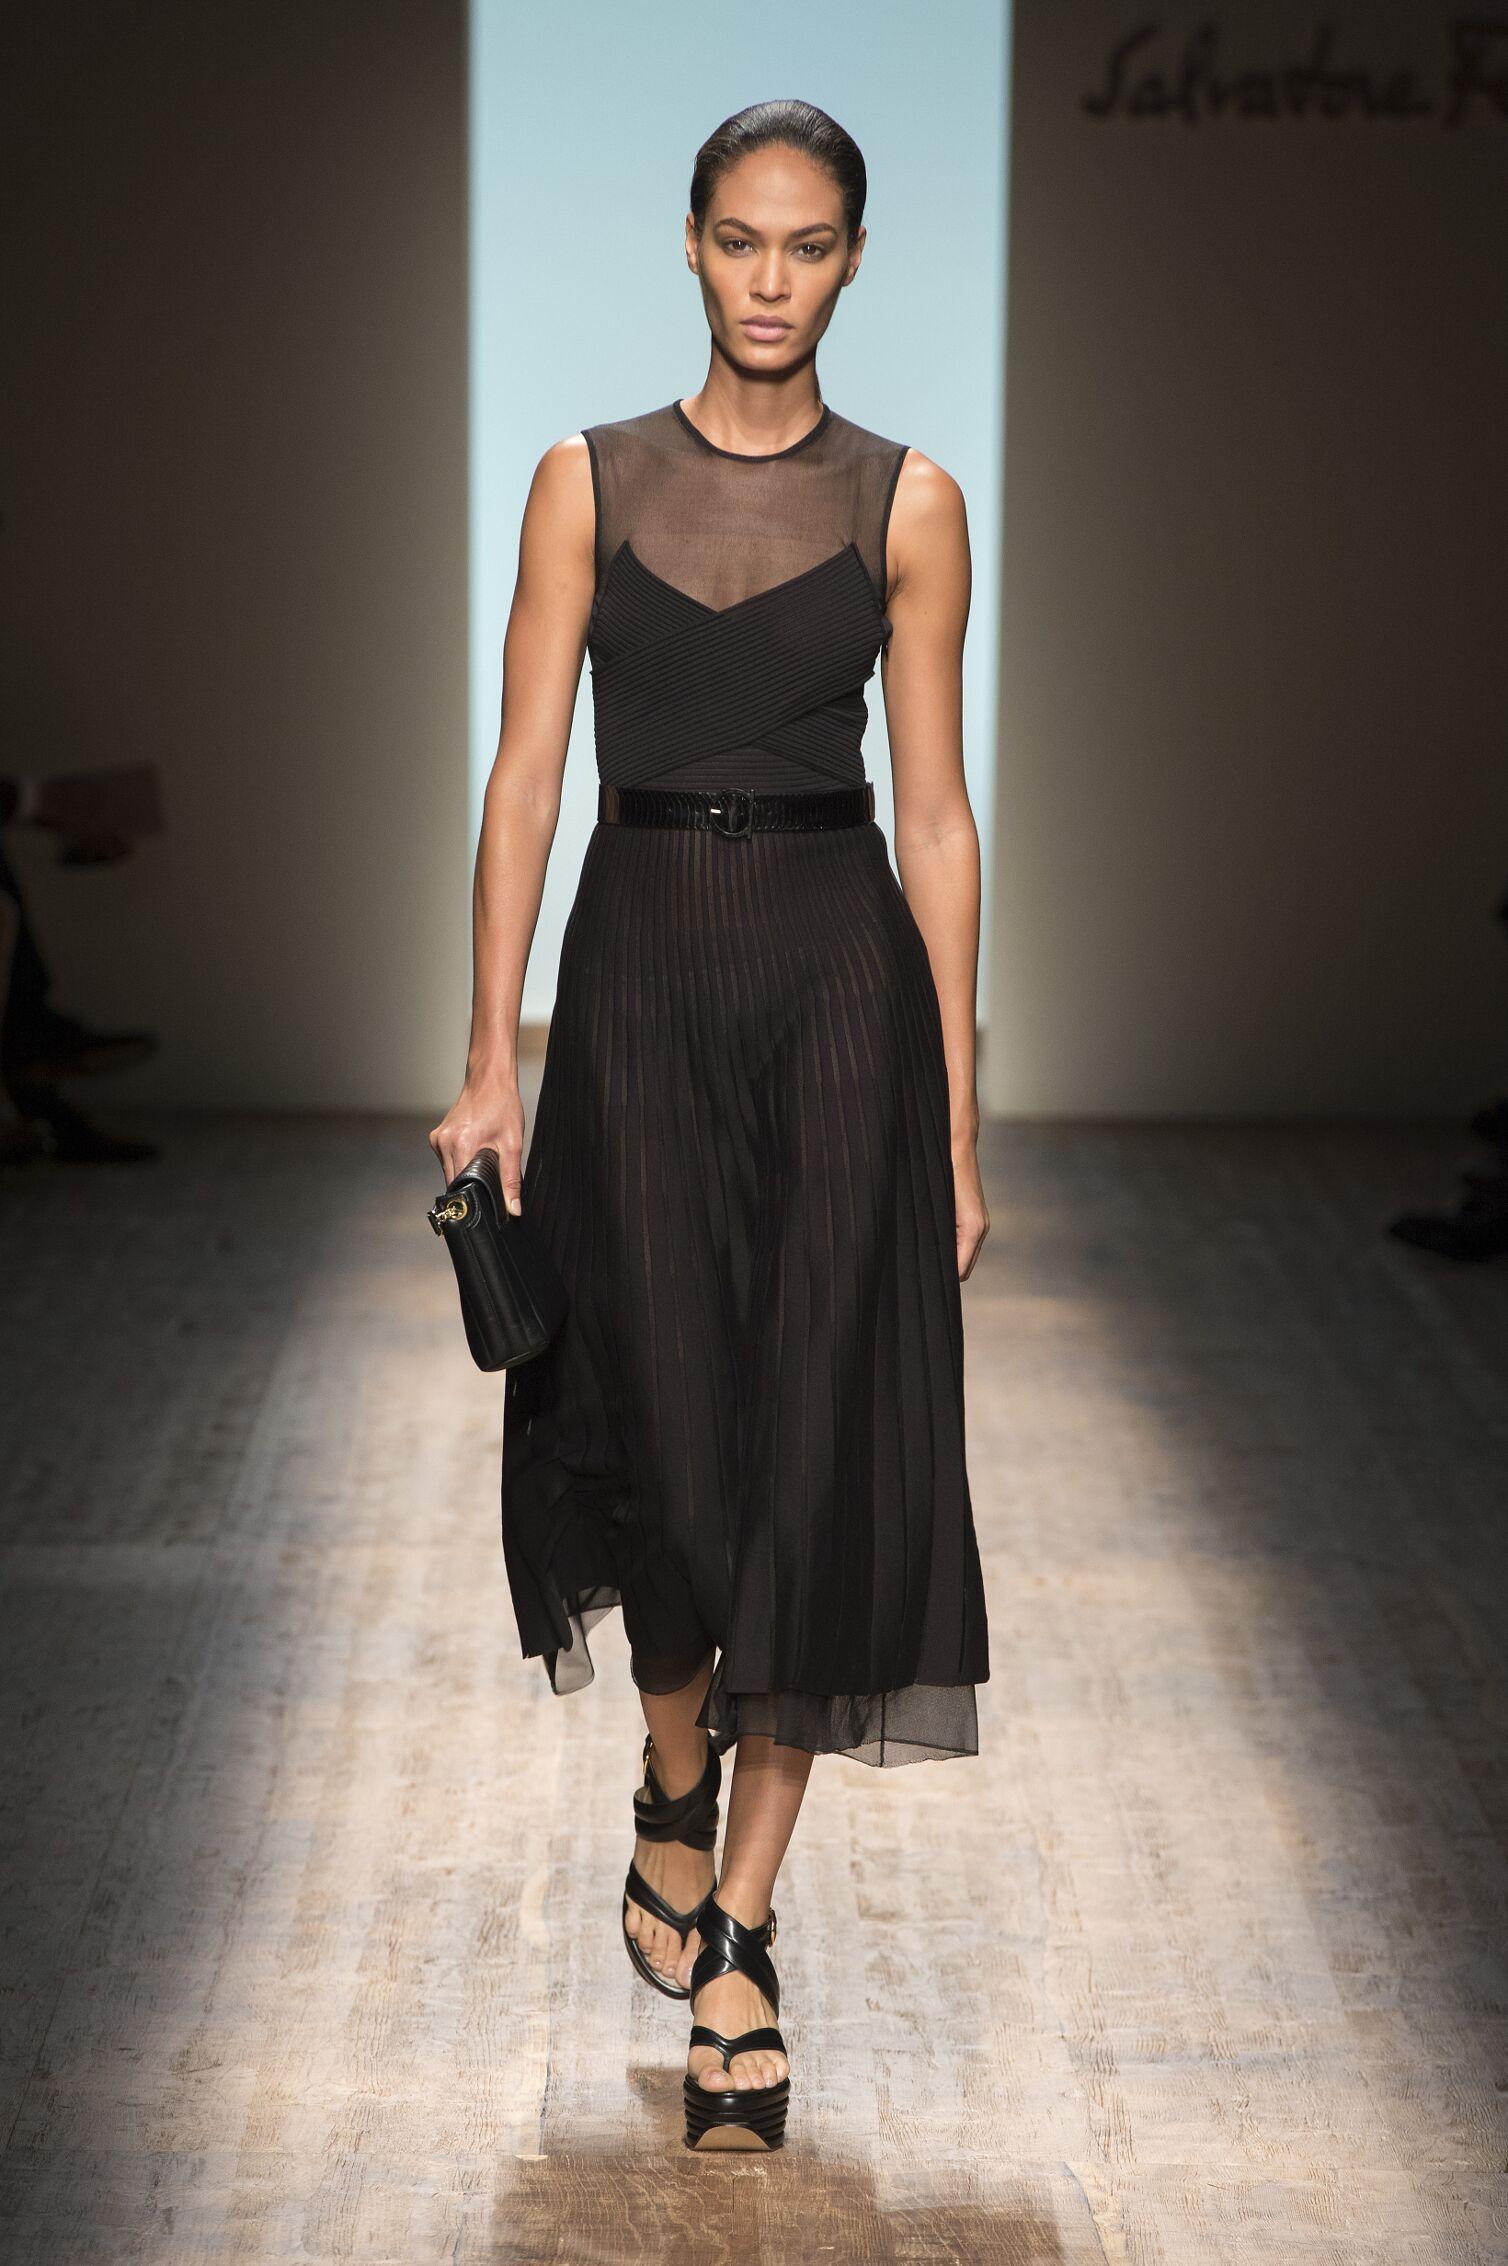 Catwalk Salvatore Ferragamo Woman Fashion Show Summer 2015